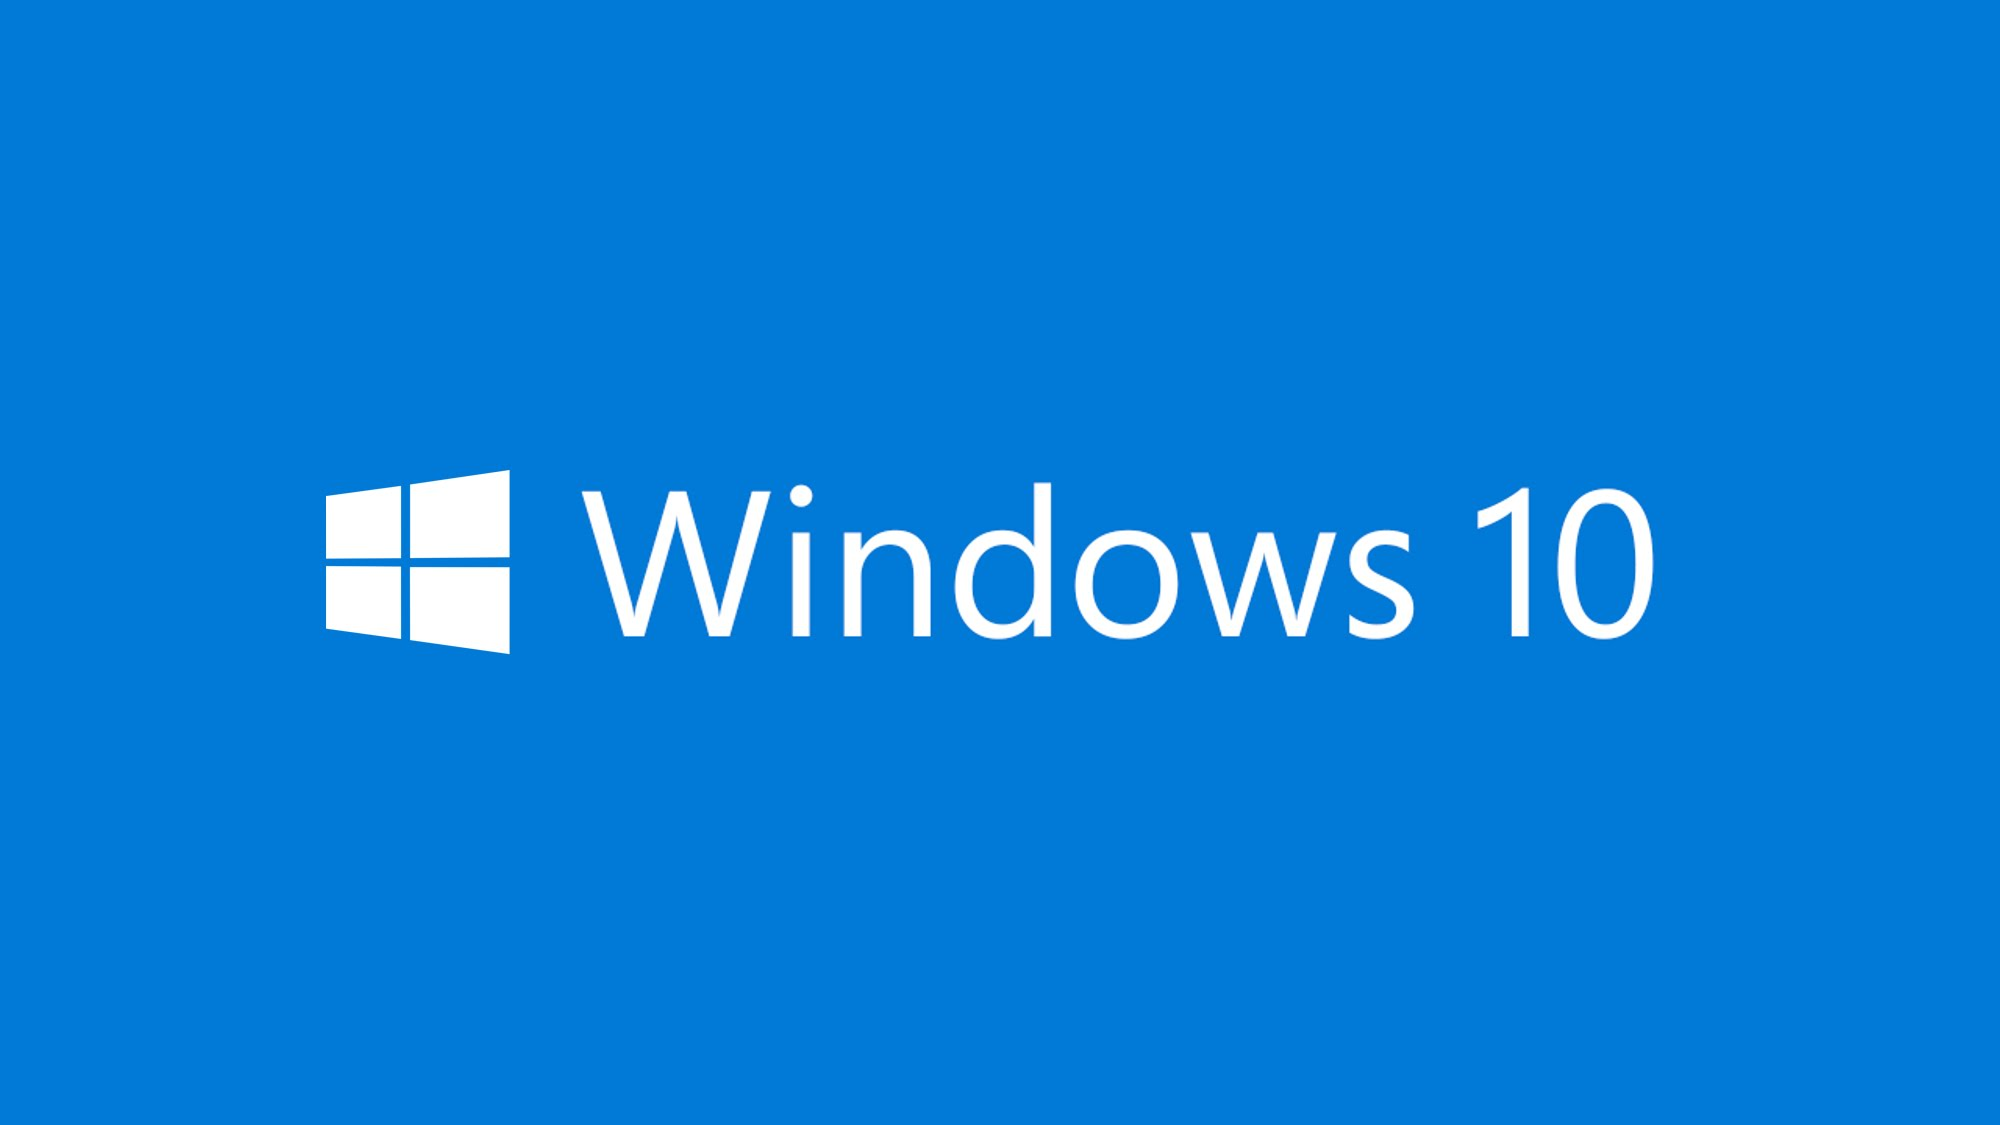 windows 10 pc speed improvment tips